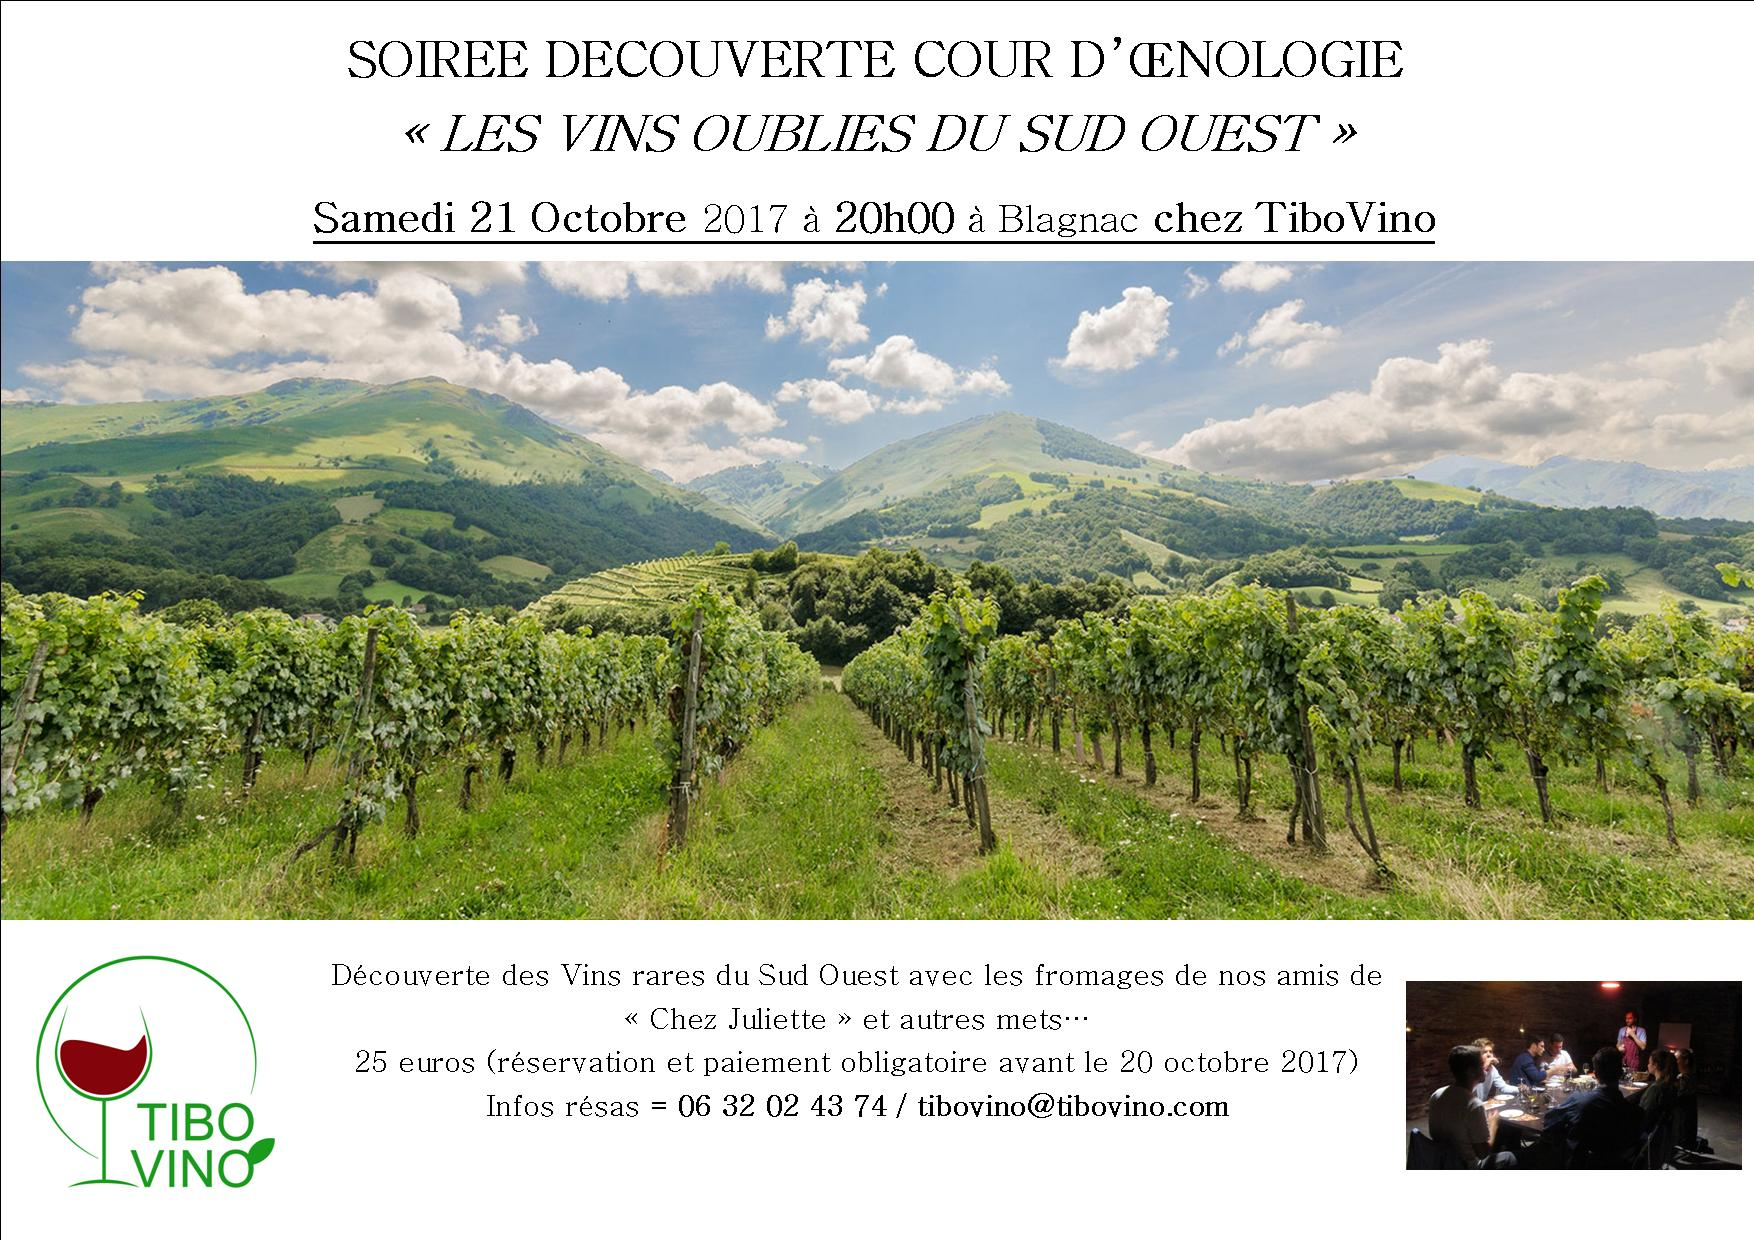 degustation-vin-cours-oenologie-toulouse-blagnac1.jpg